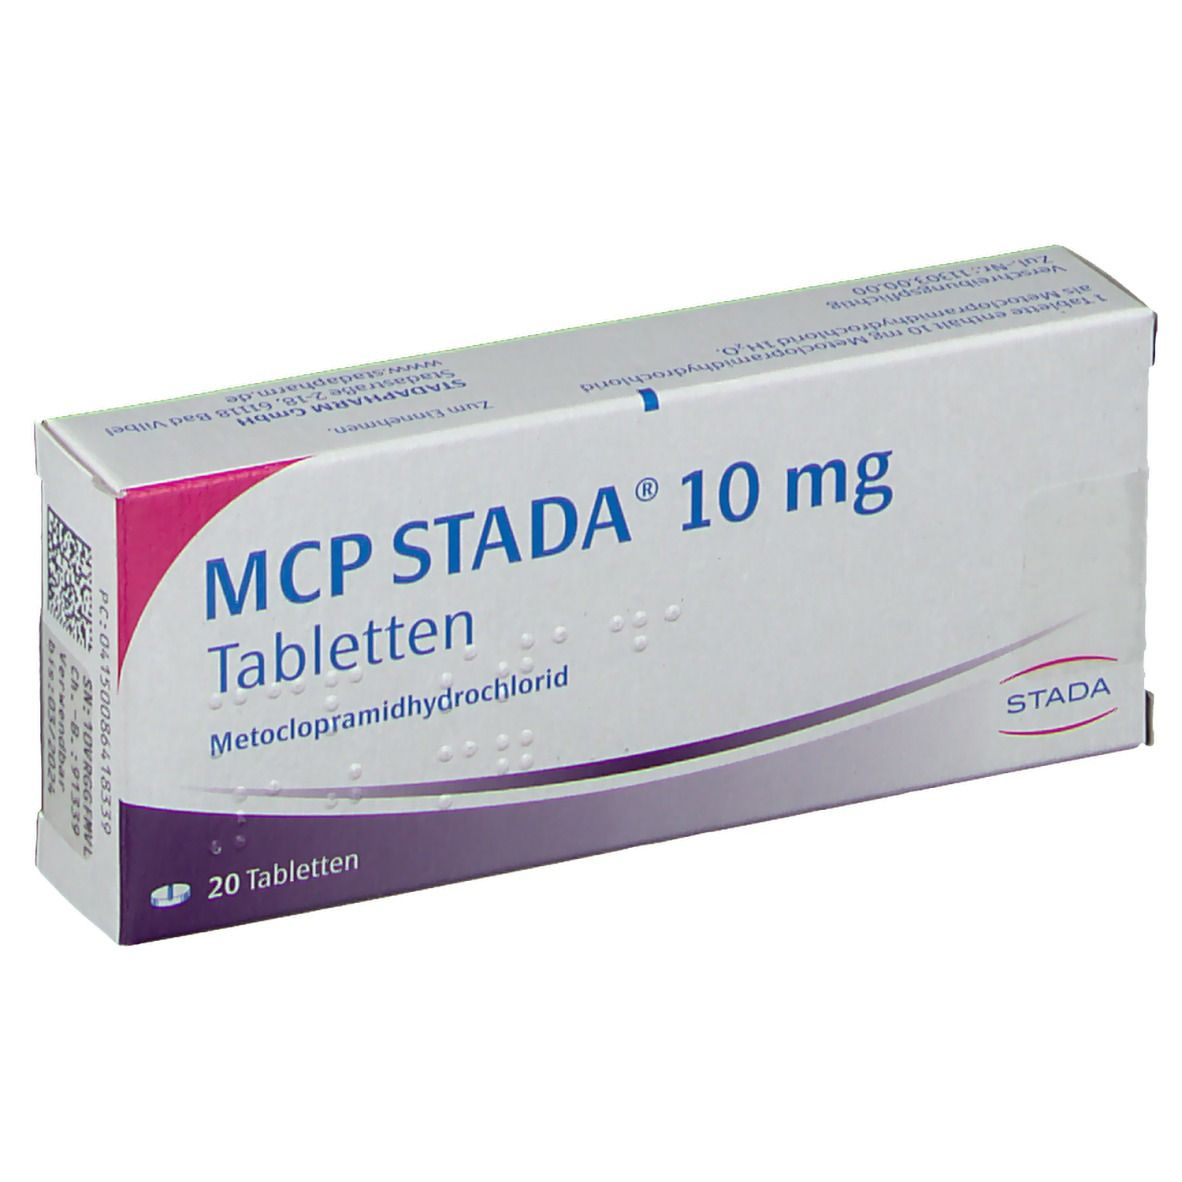 mit.mcp tabletten abnehmen